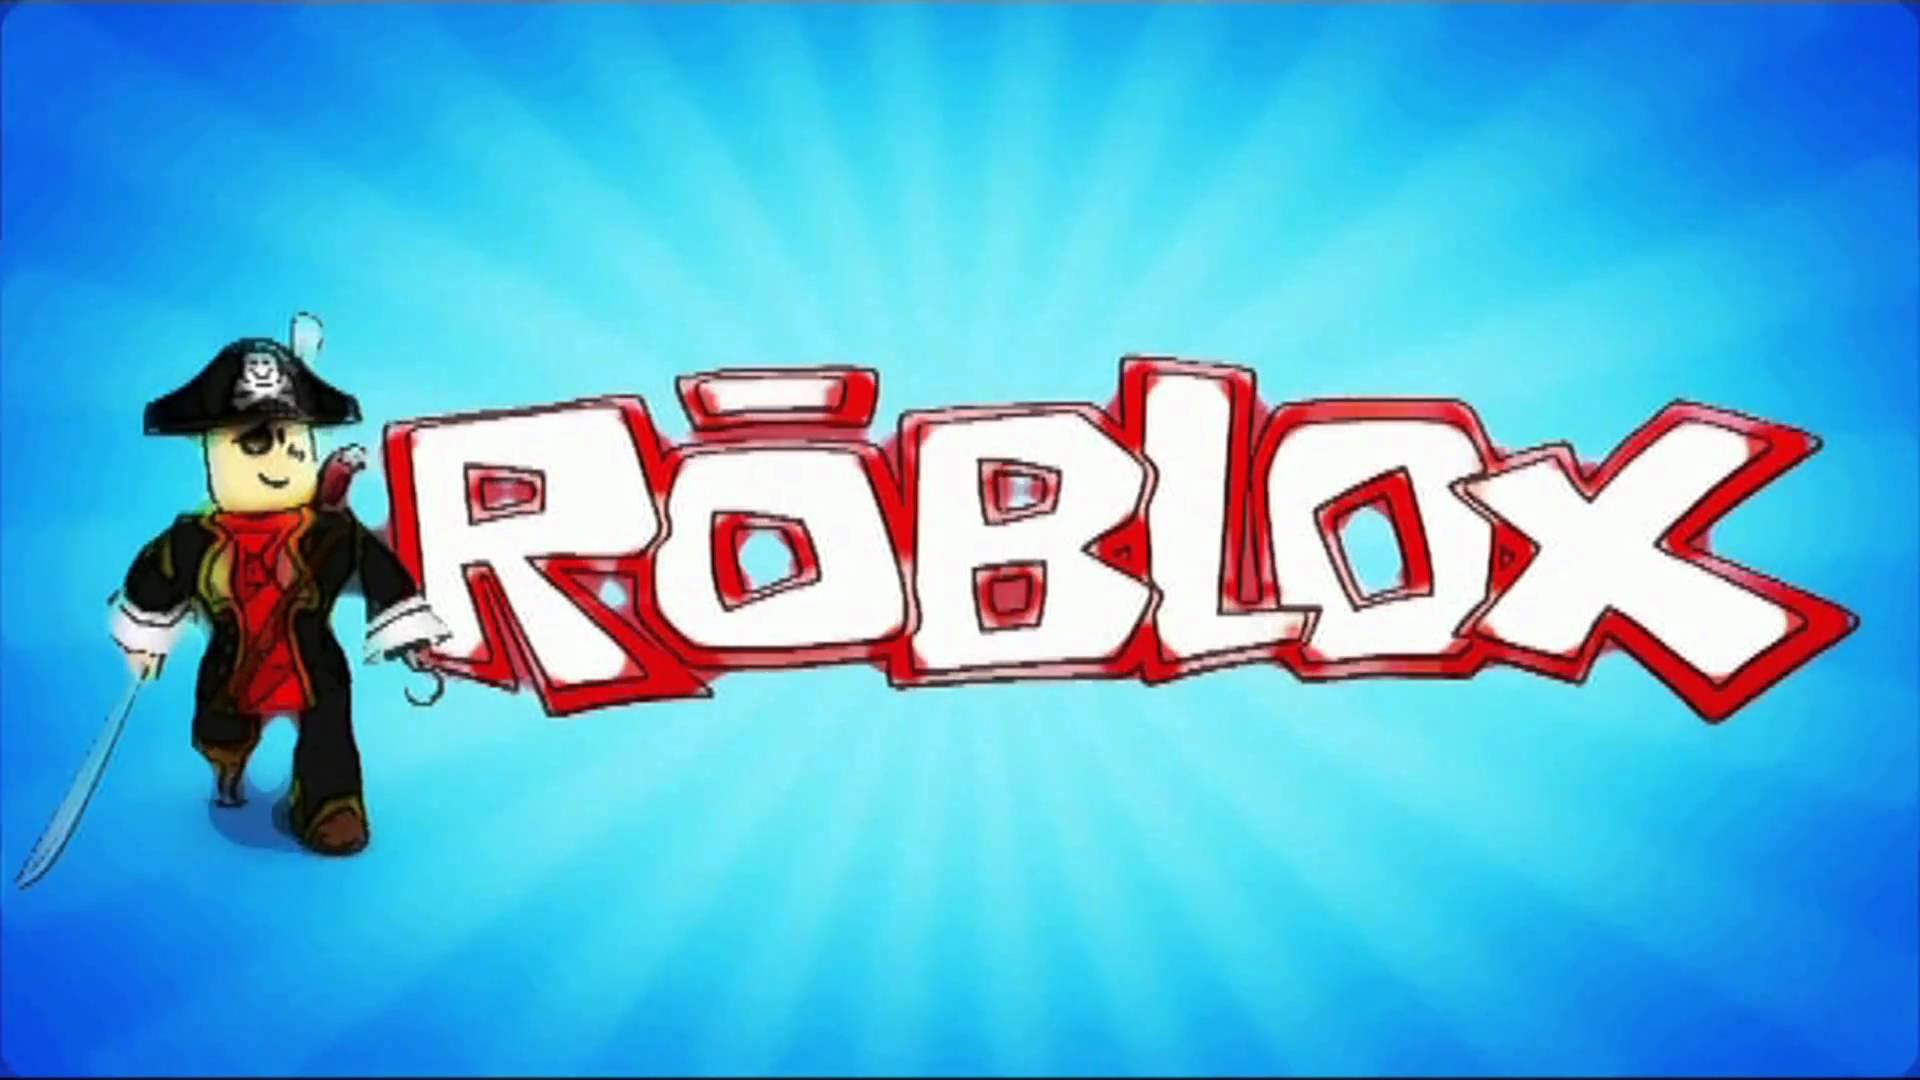 Cool Roblox Logos For Youtube Roblox Youtube Logos